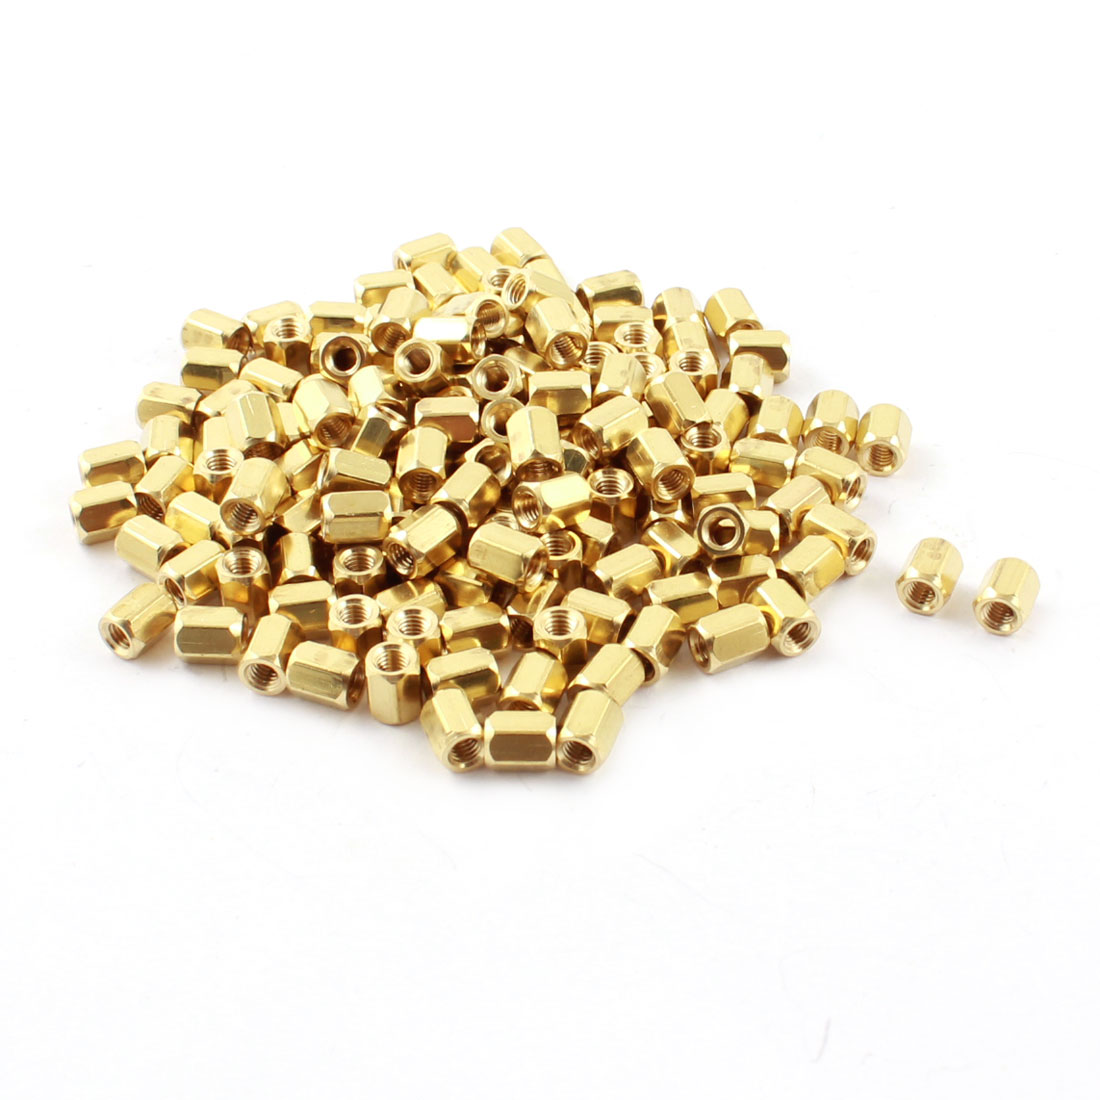 150Pcs M3 Female Thread 6mm Length Dual Ends Gold Tone Brass Pillar PCB Standoff Hexagonal Nut Spacer